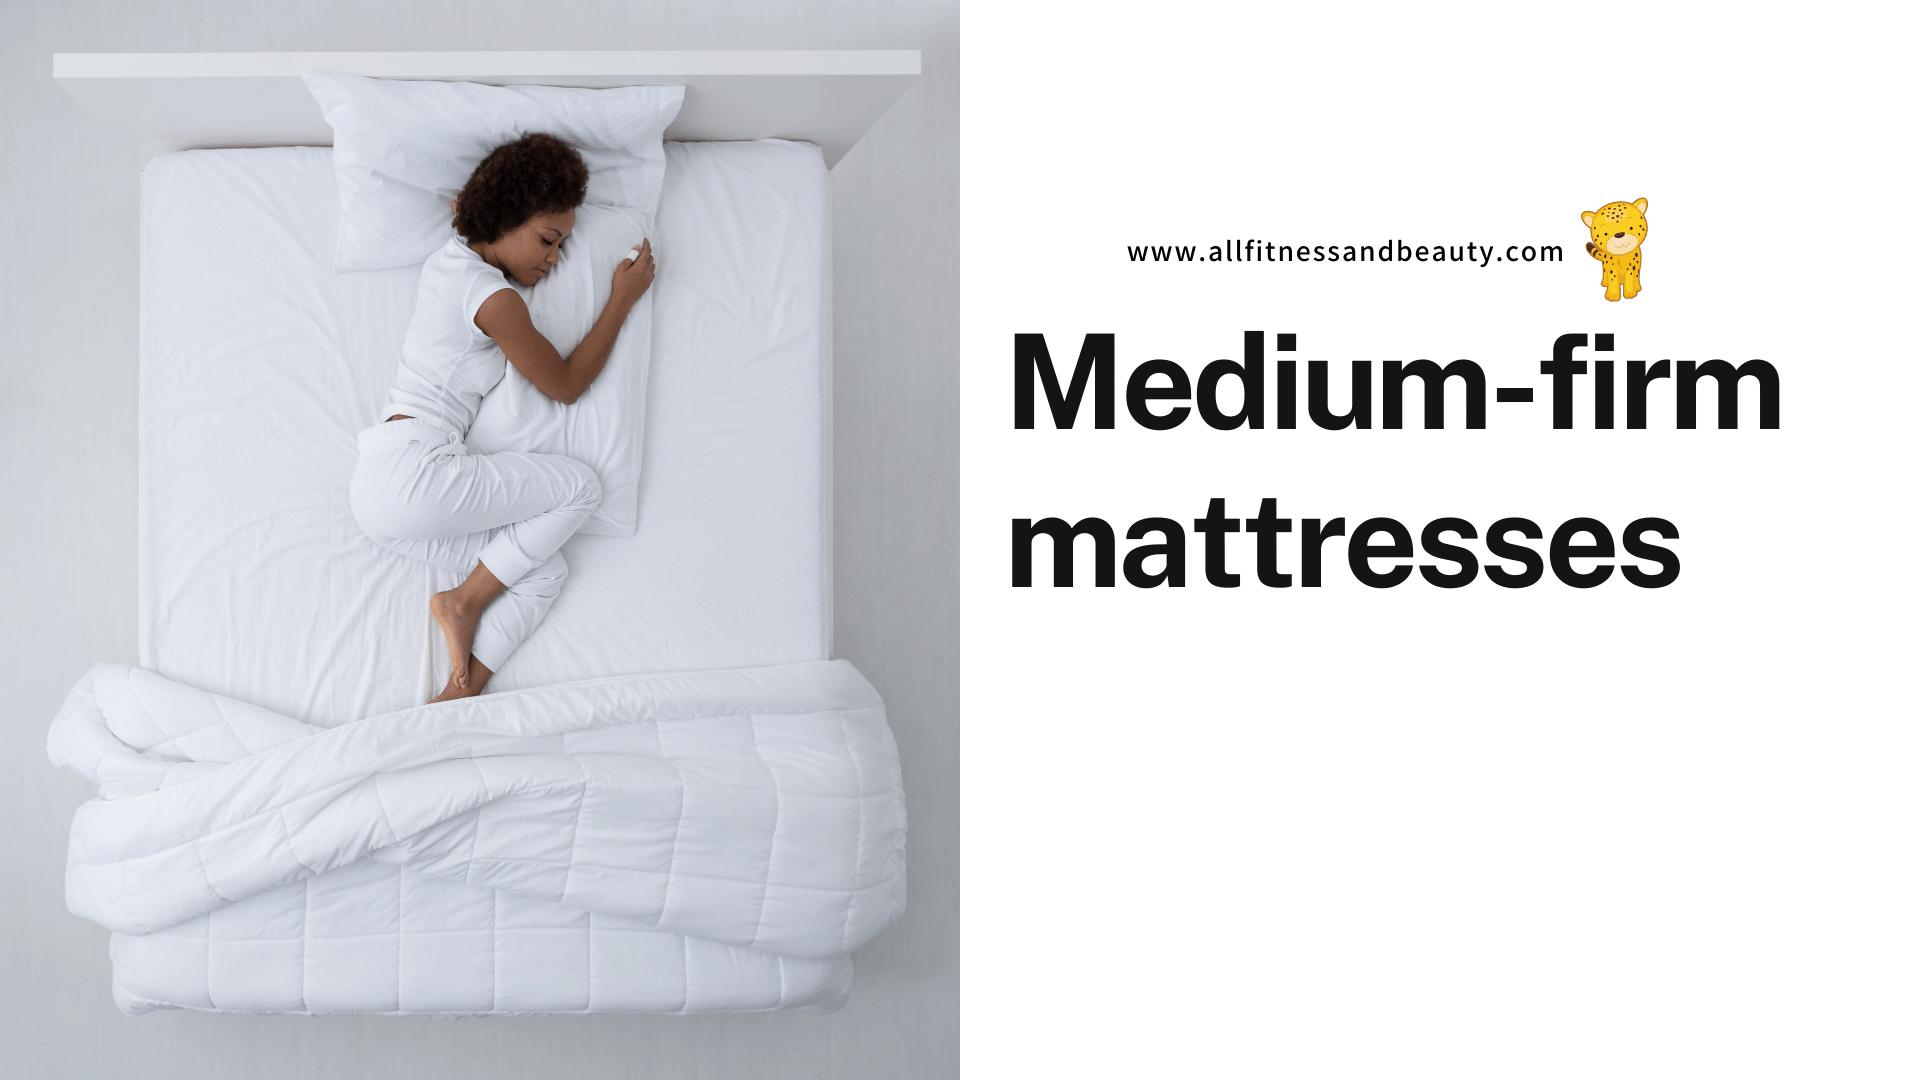 Mattresses for Good Posture - medium firm